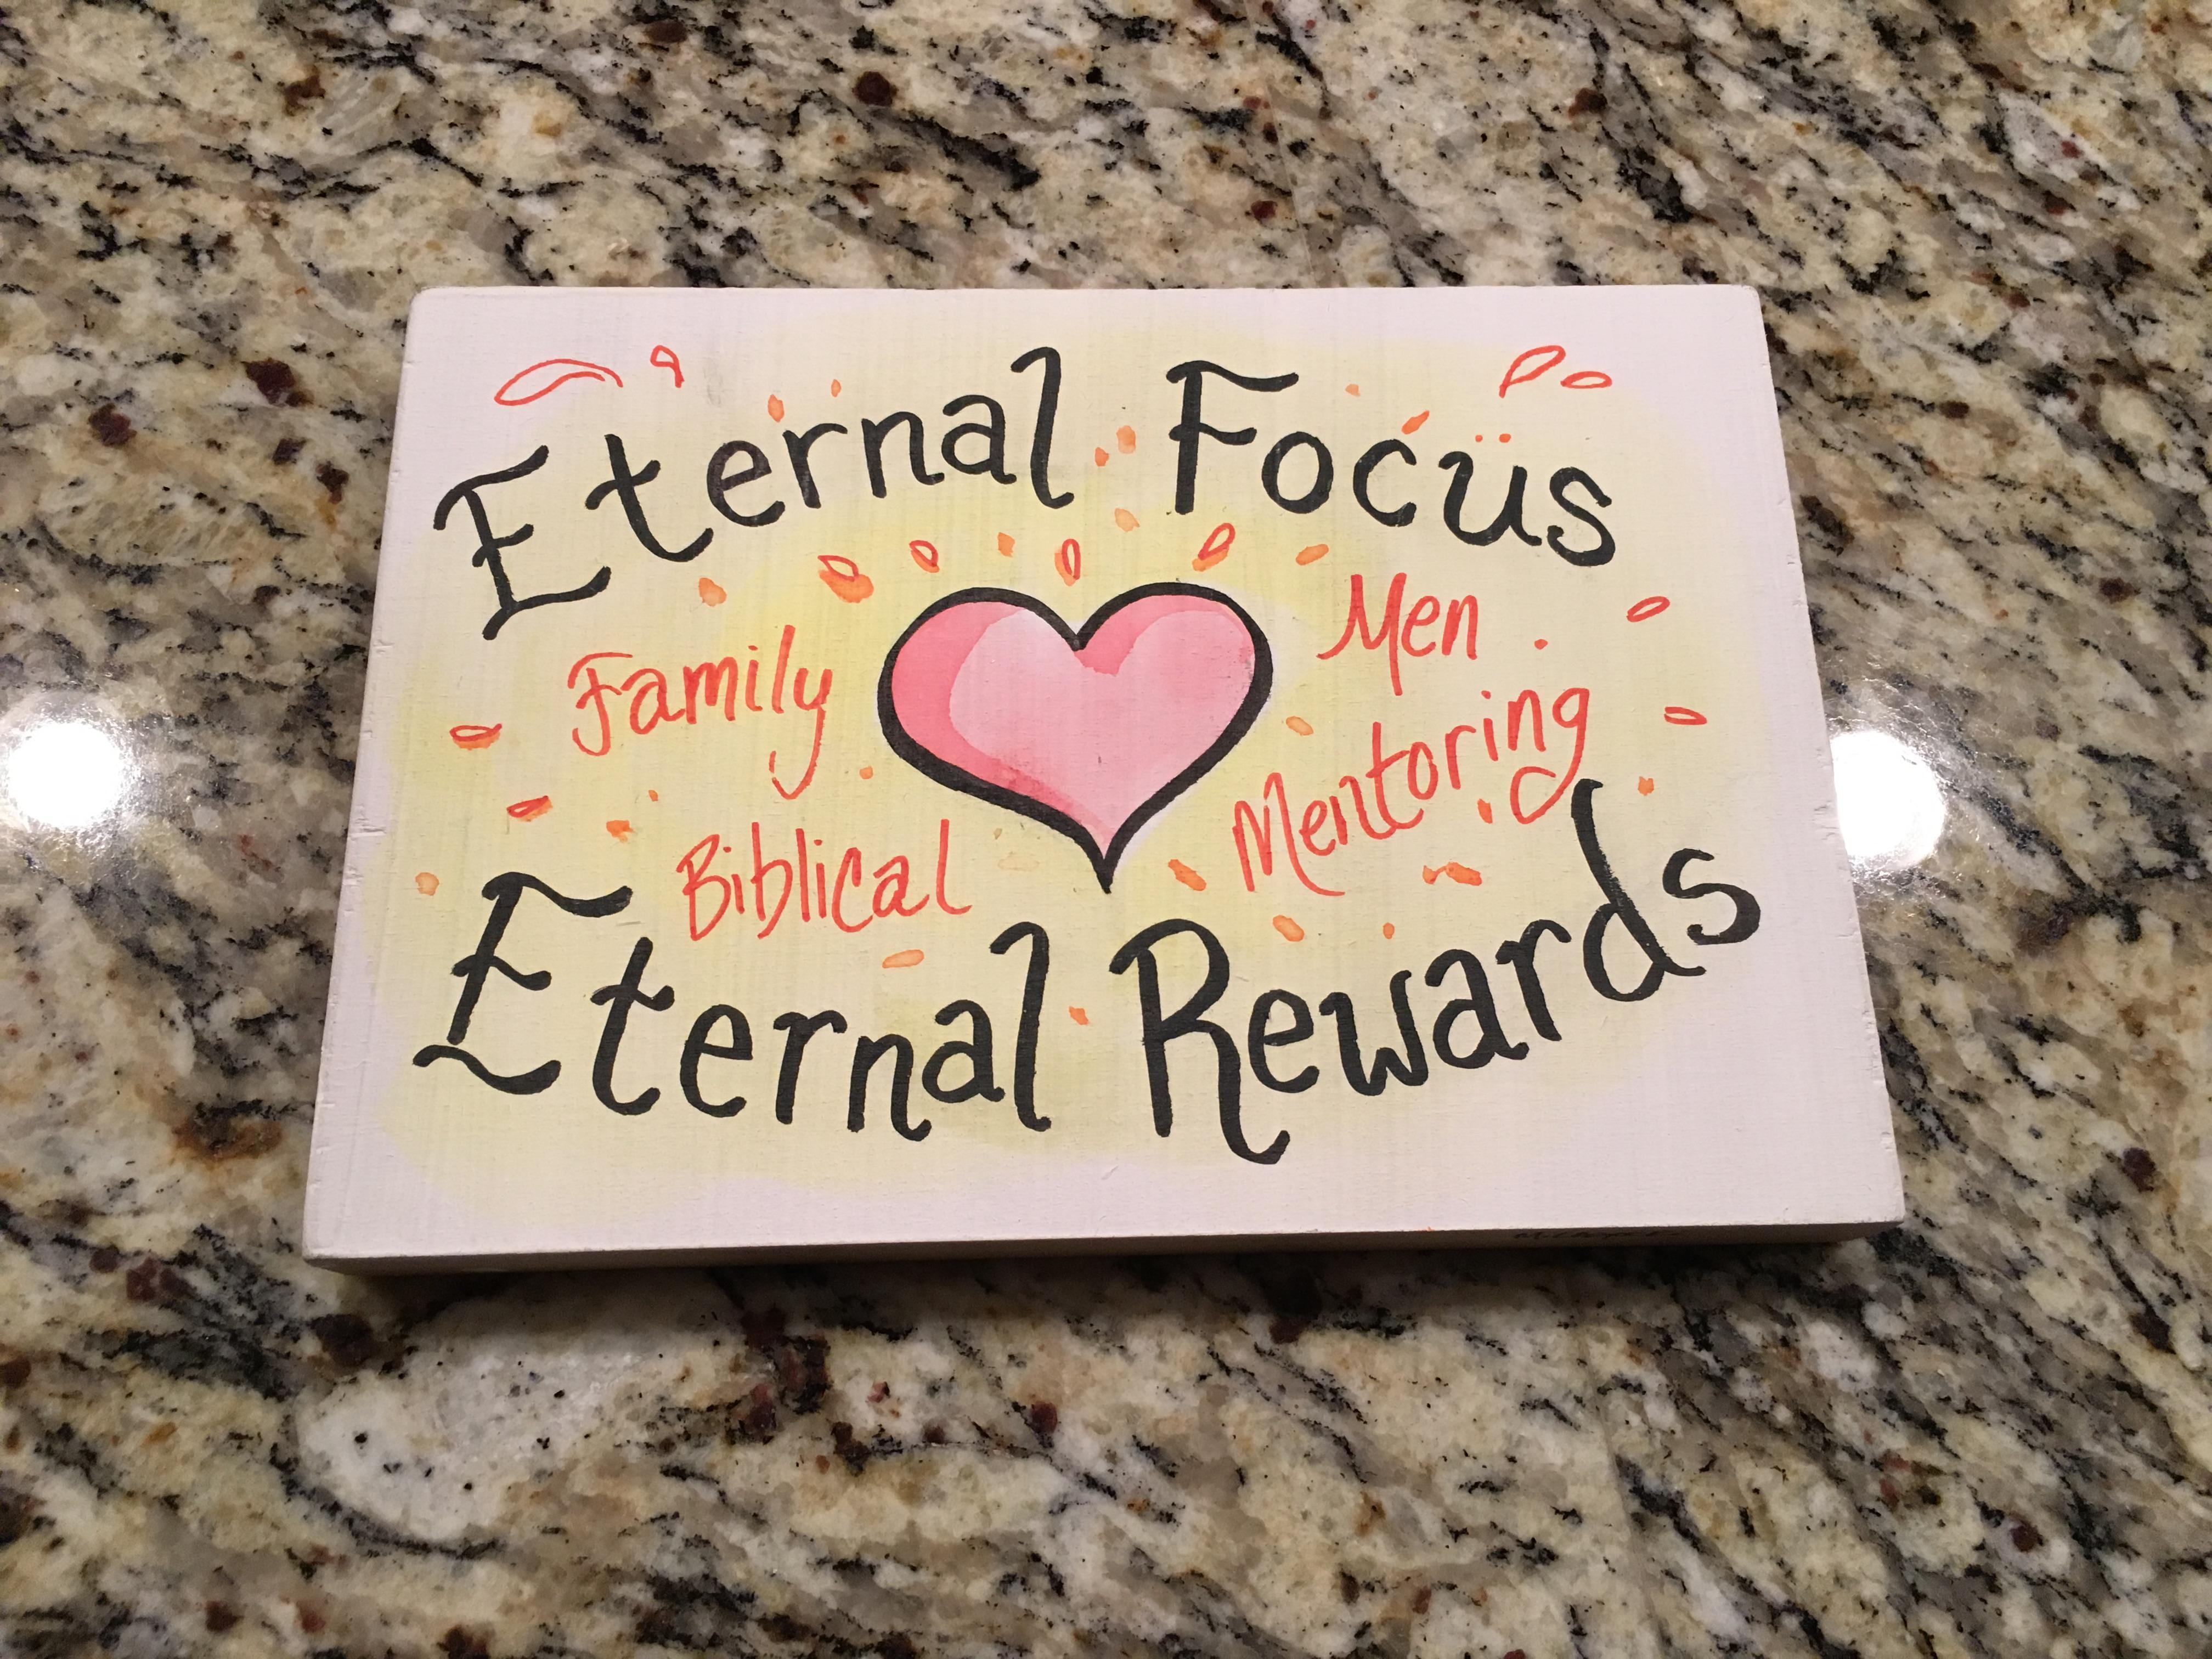 Eternal Focus, eternal rewards